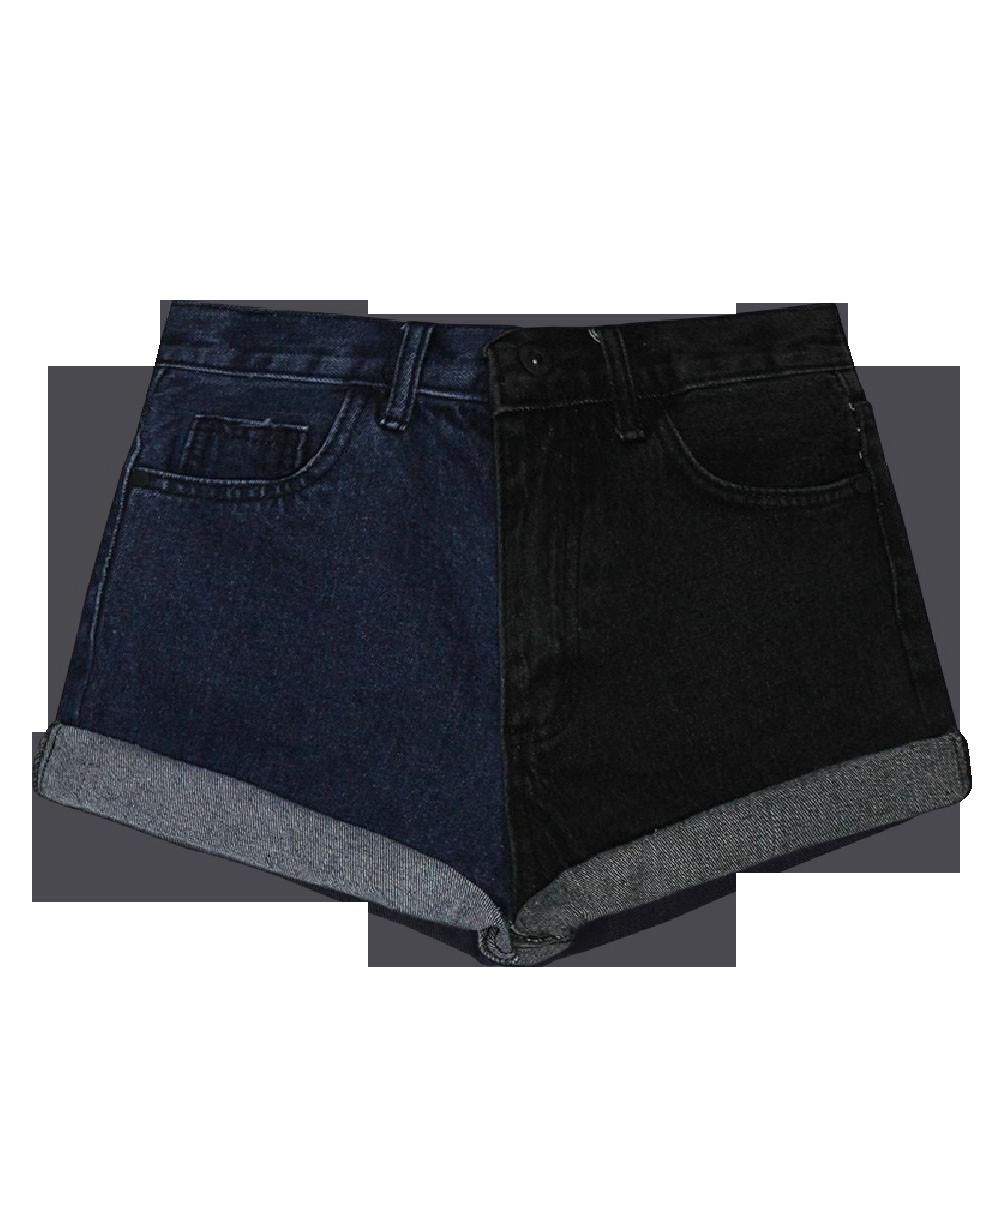 Mid and High Waist Denim Shorts